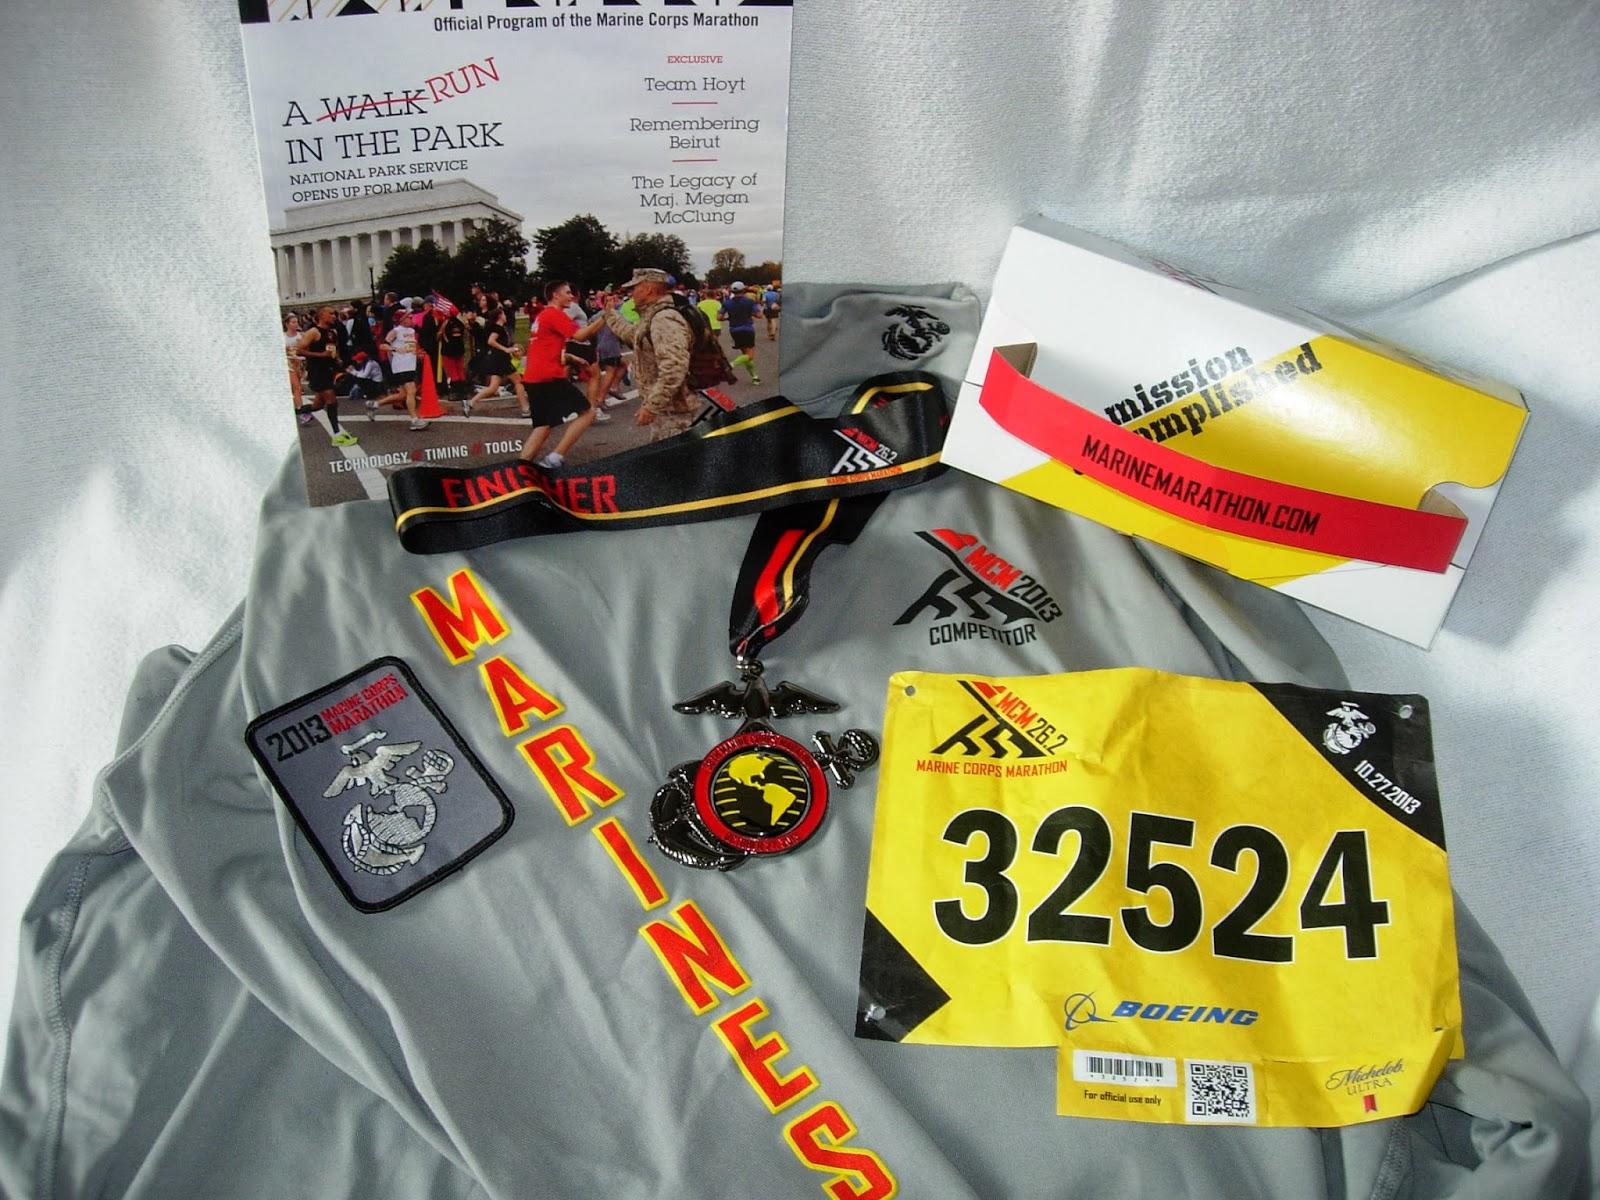 K e swab marine corps marathon october 27 2013 for Marine corps marathon shirt 2017